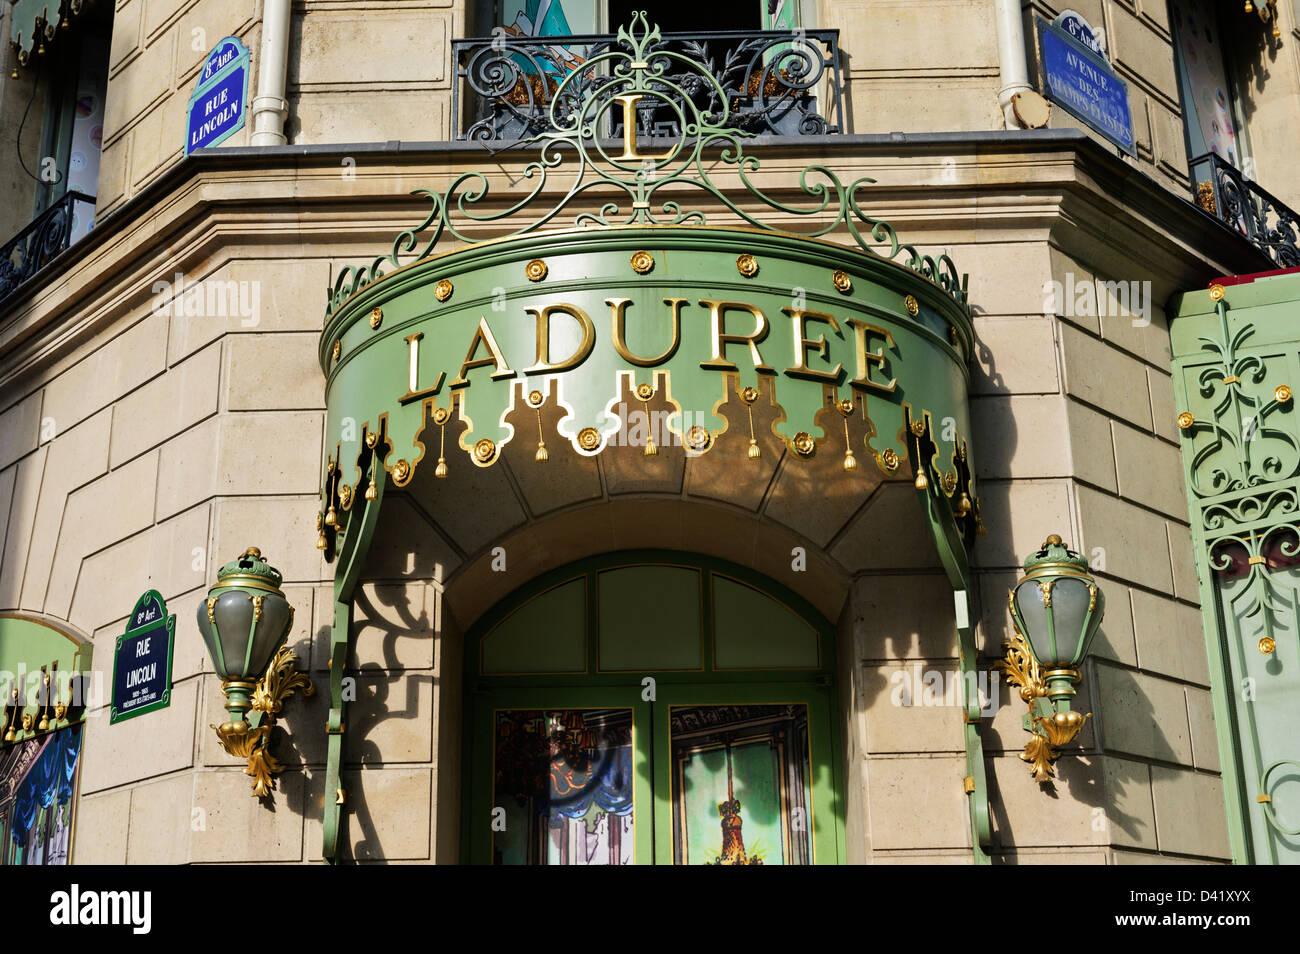 LaDuree patisserie classic main entrance, Paris, France. - Stock Image